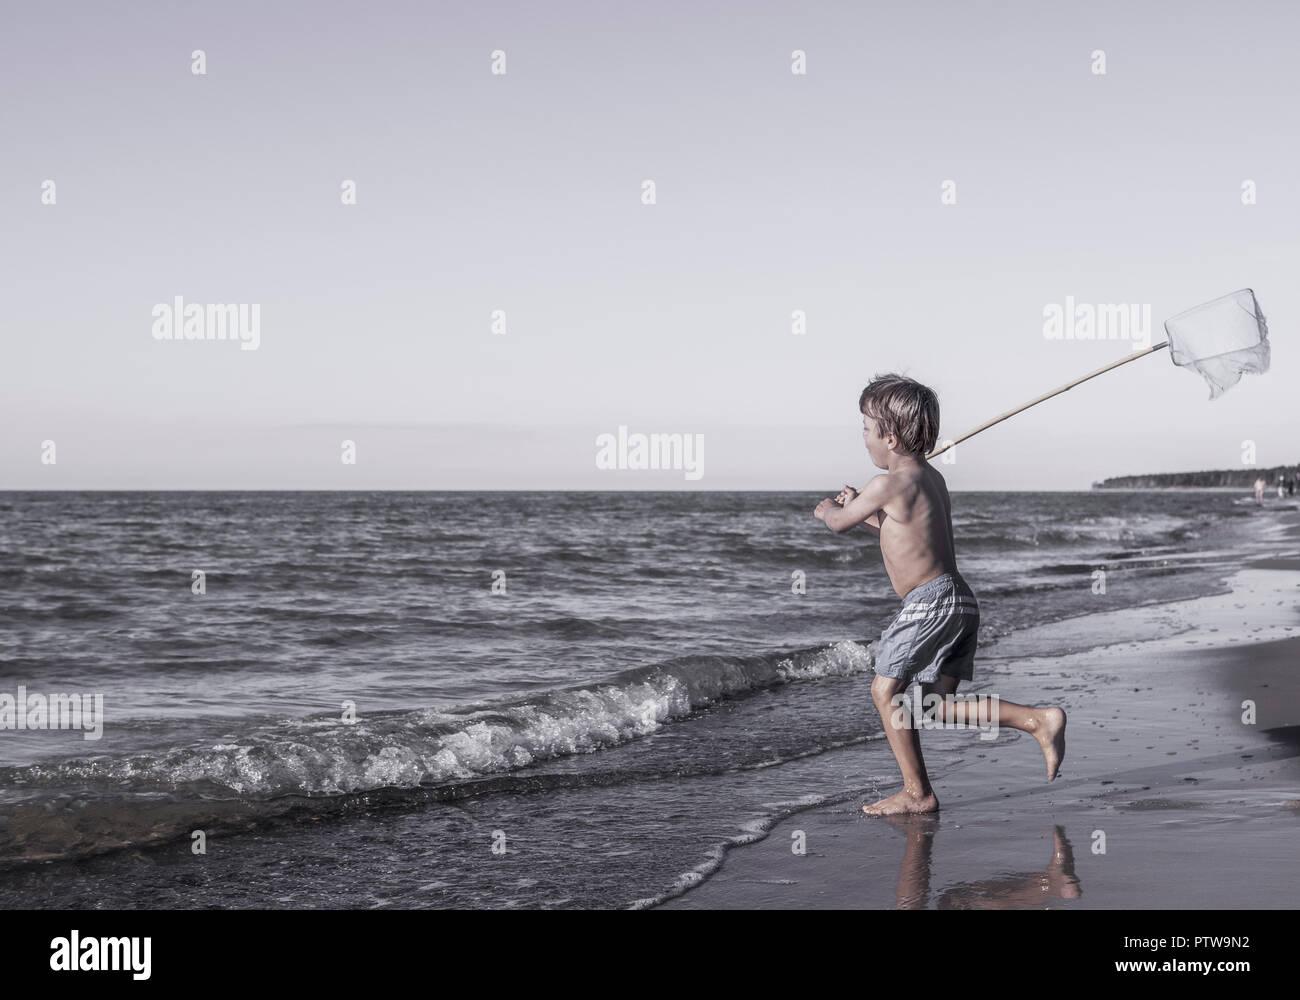 Junge mit kleinem Kescher am Strand (model-released) - Stock Image